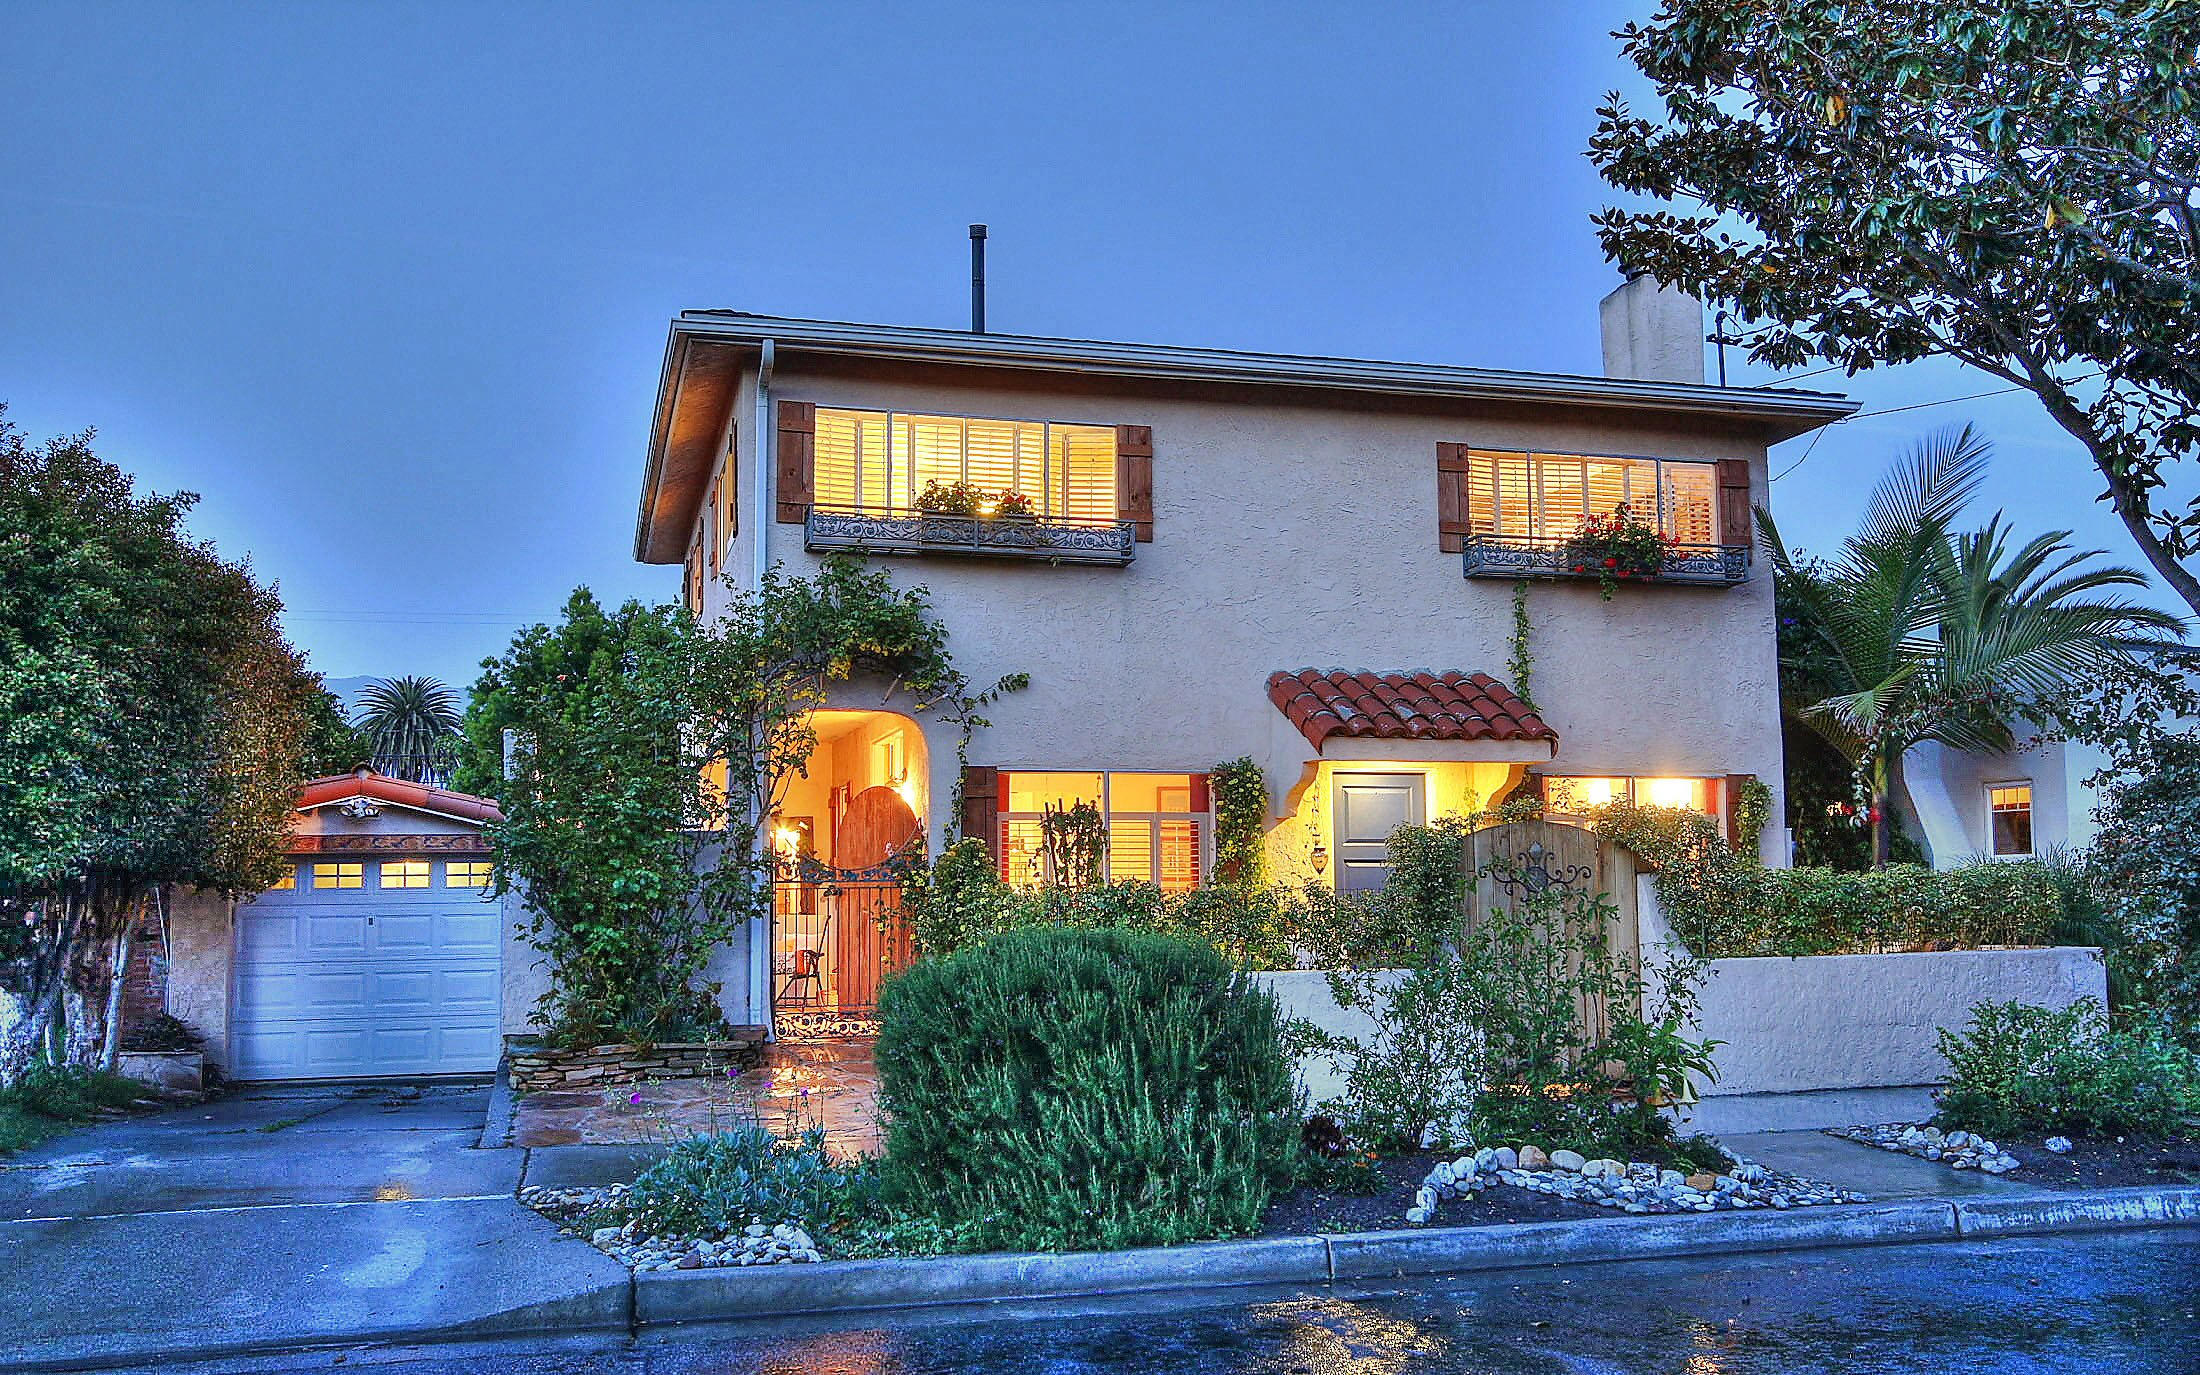 Property photo for 1410 Kowalski Ave Santa Barbara, California 93101 - 14-958